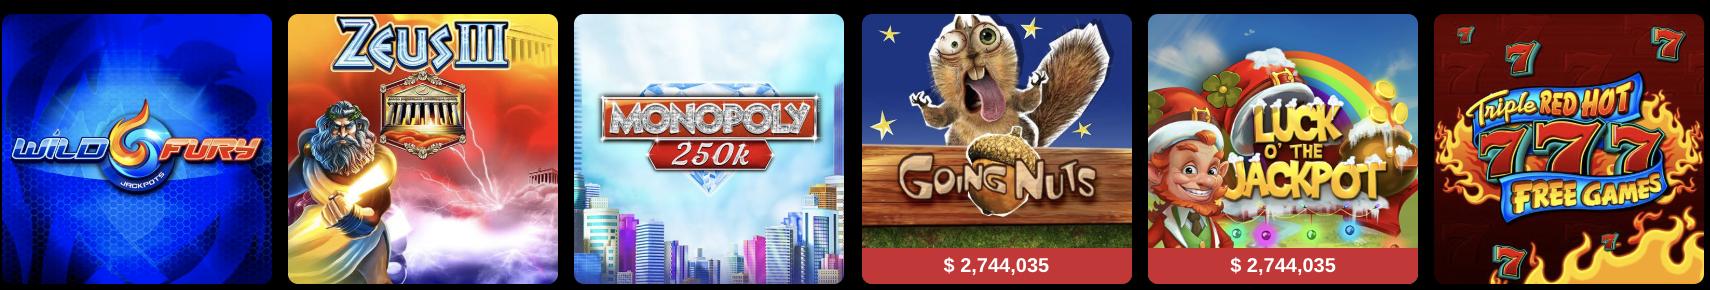 playmgm online casino nj slots